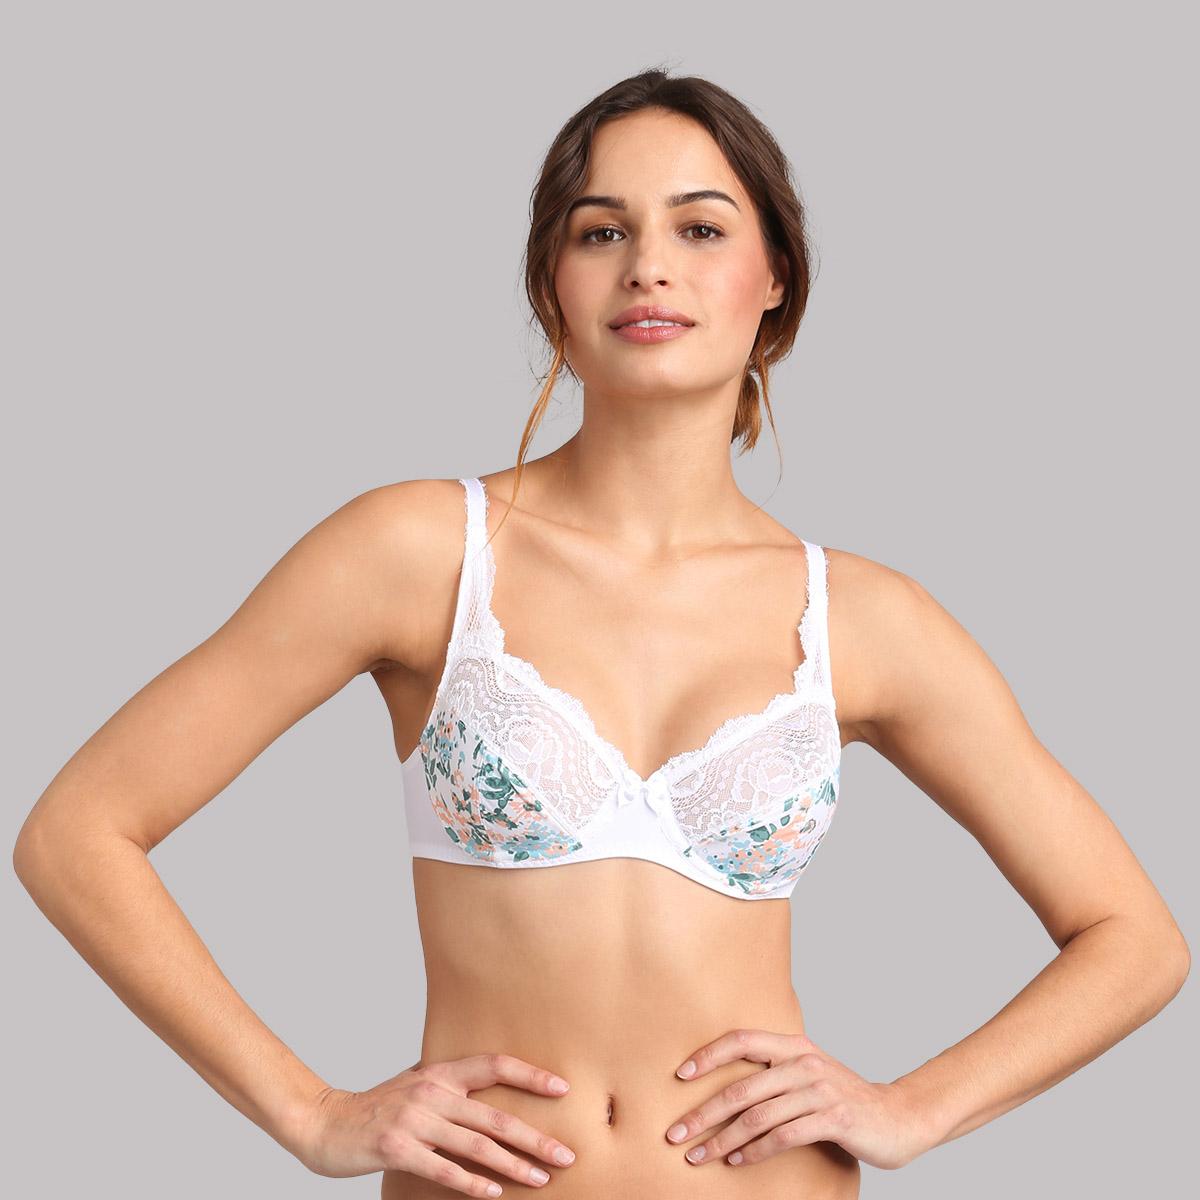 Underwired bra in white blossom print - Flower Elegance Micro, , PLAYTEX